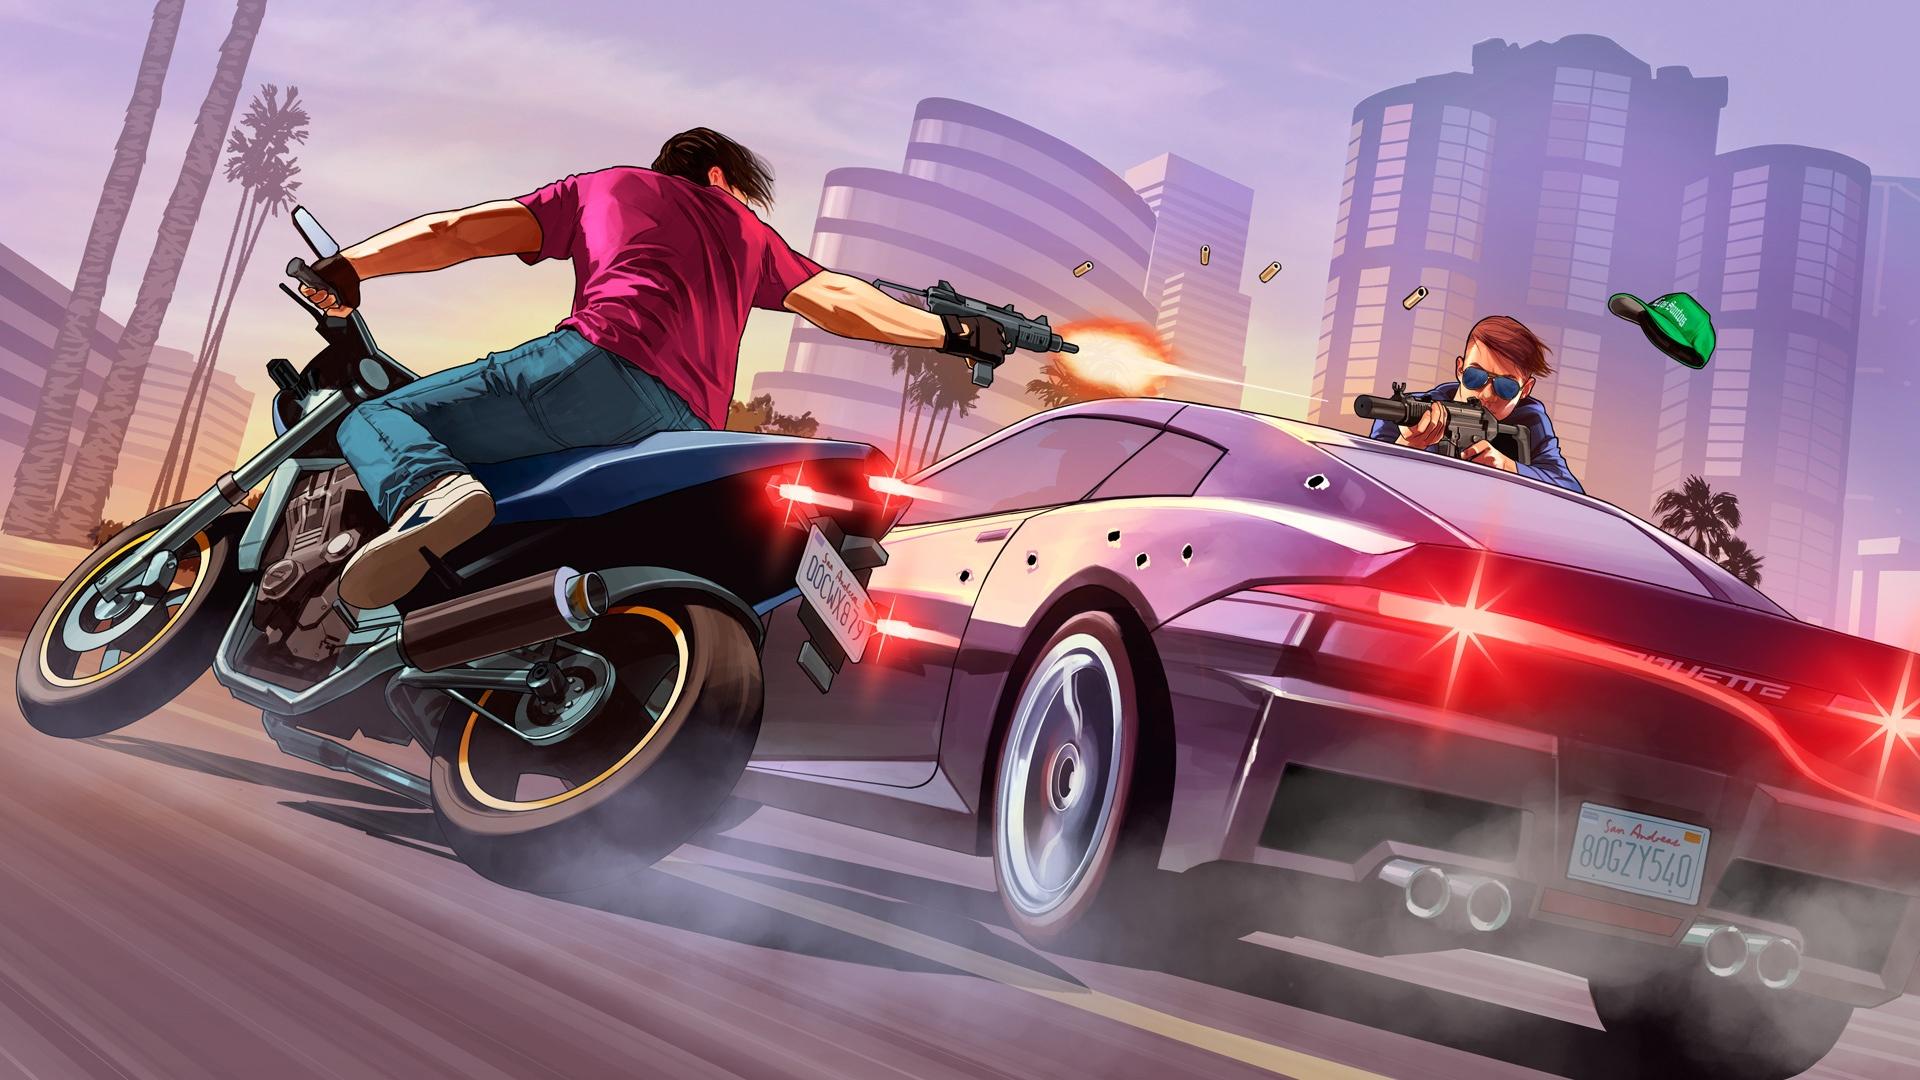 Download Grand Theft Auto V GTA 5 Video Game HD Wallpaper Search more 1920x1080